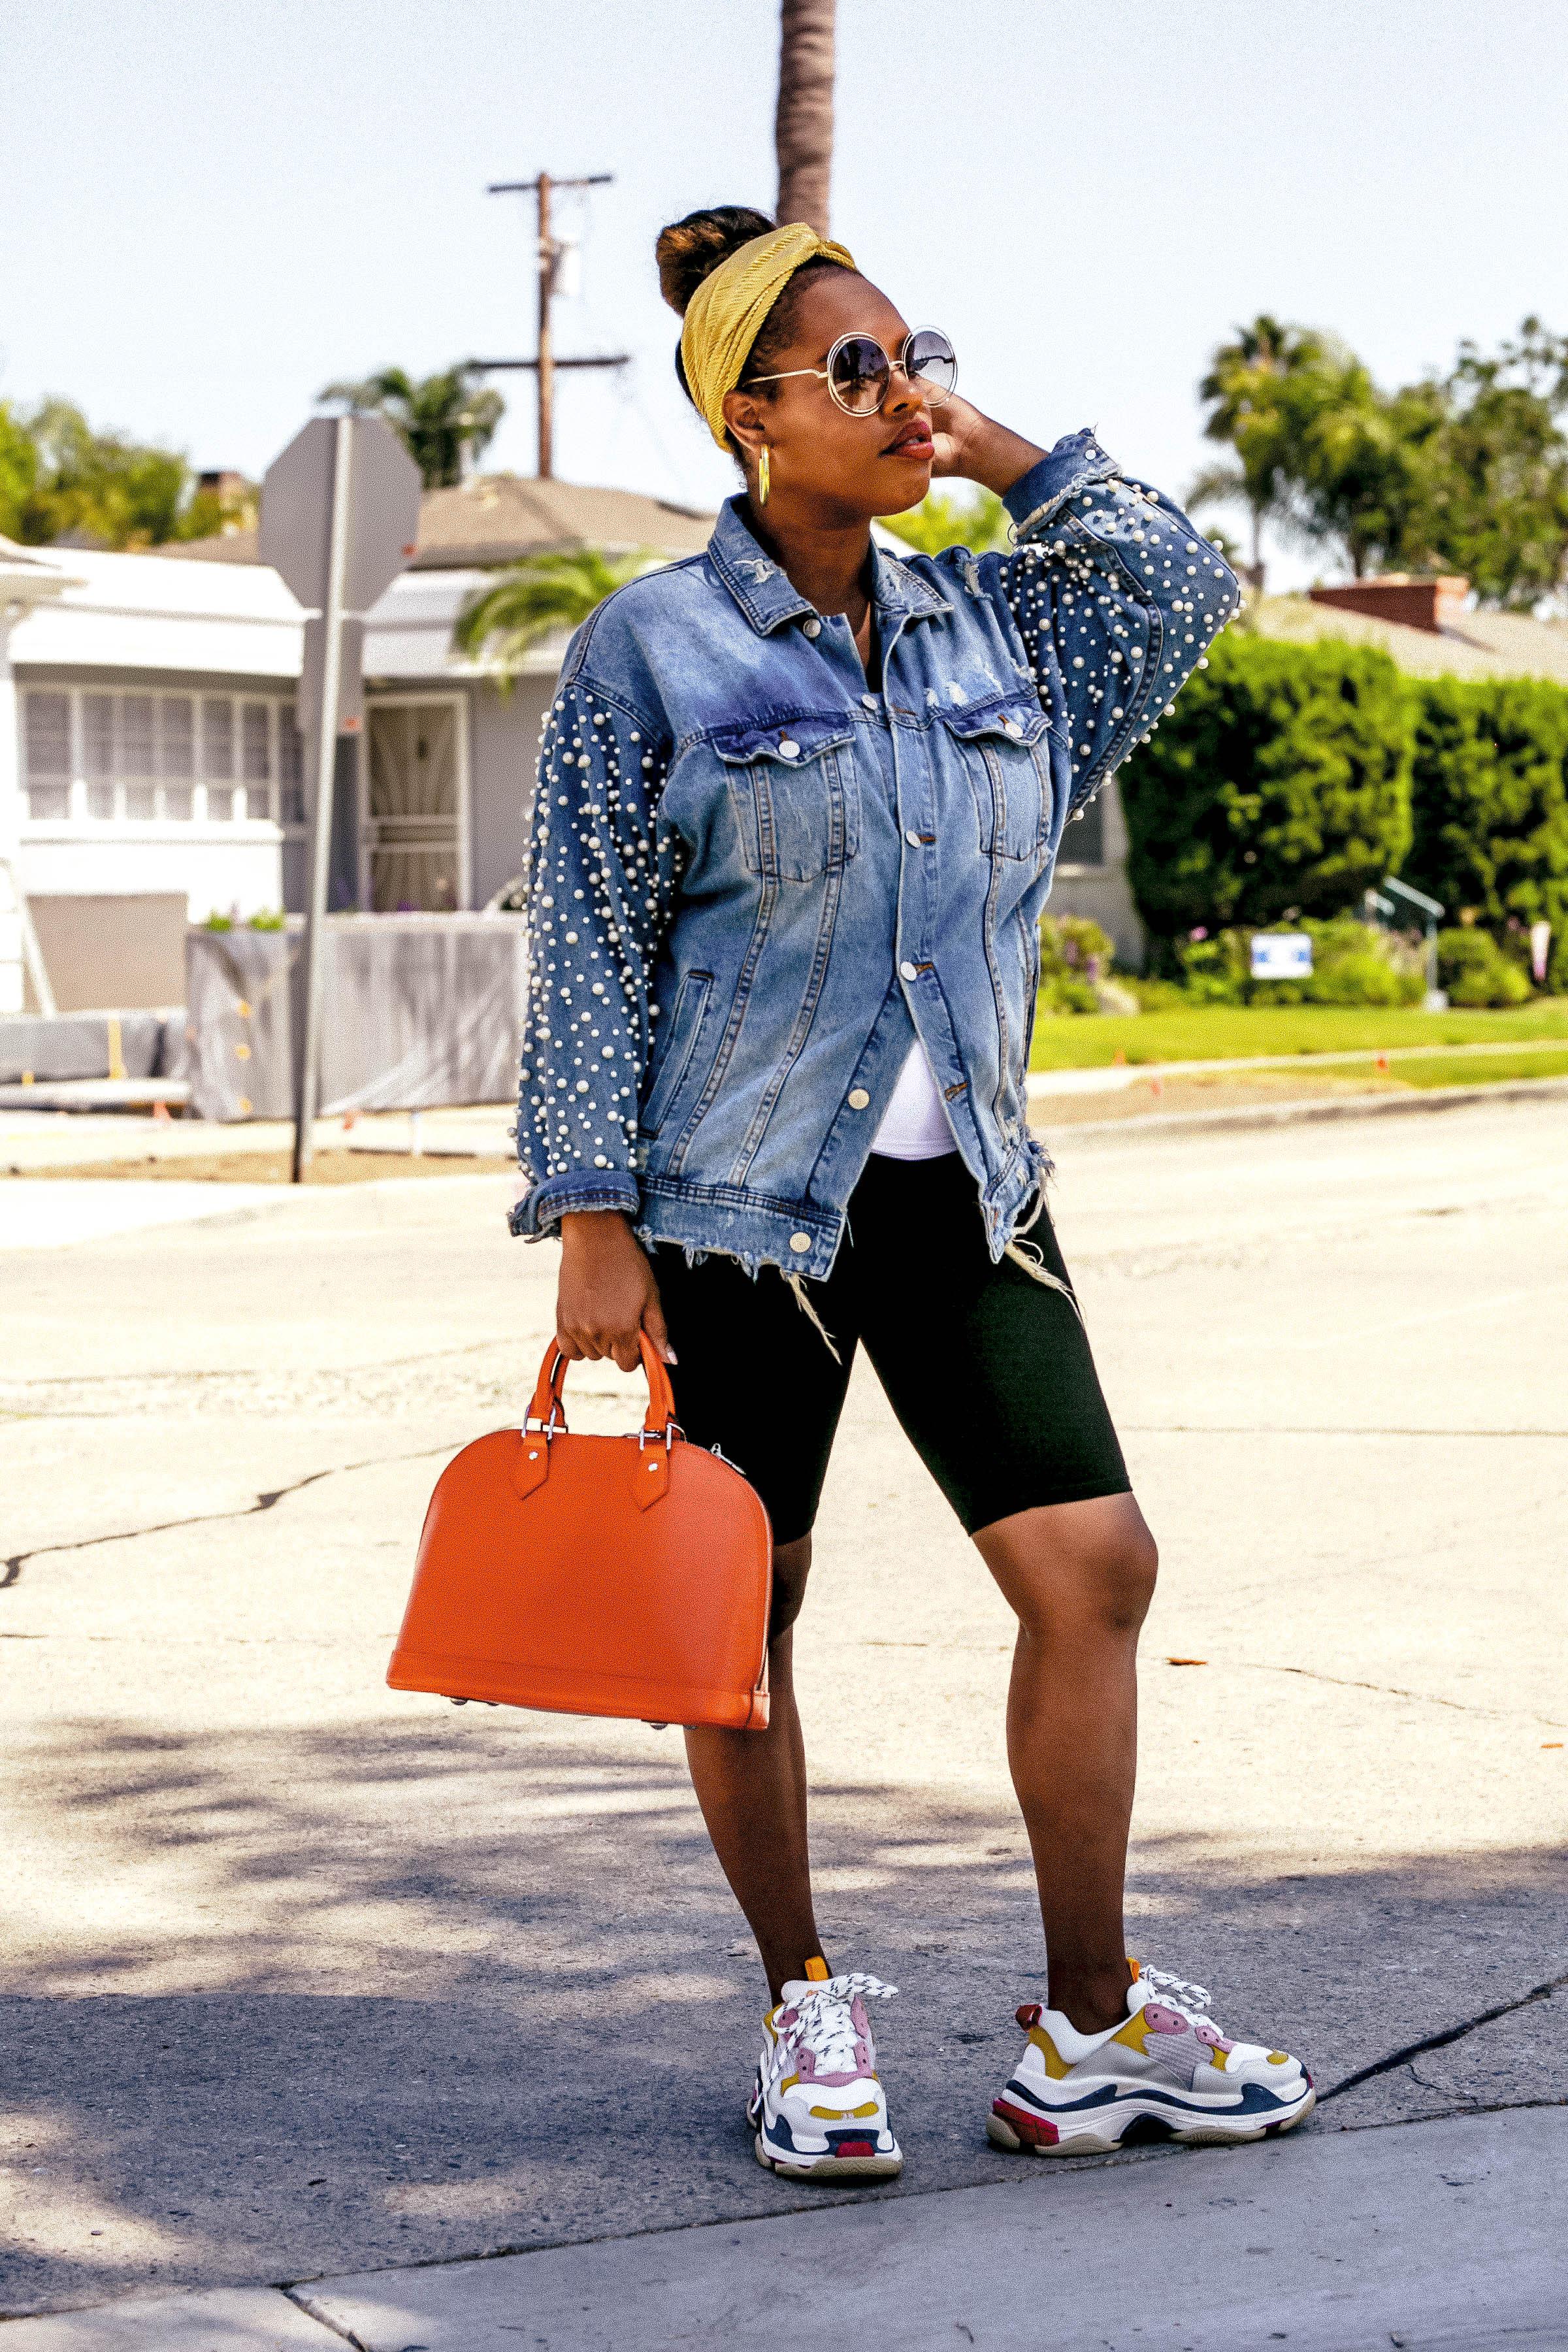 LA Blogger, Balenciaga, Louis Vuitton, Alexander McQueen, Granddad sneakers, trend